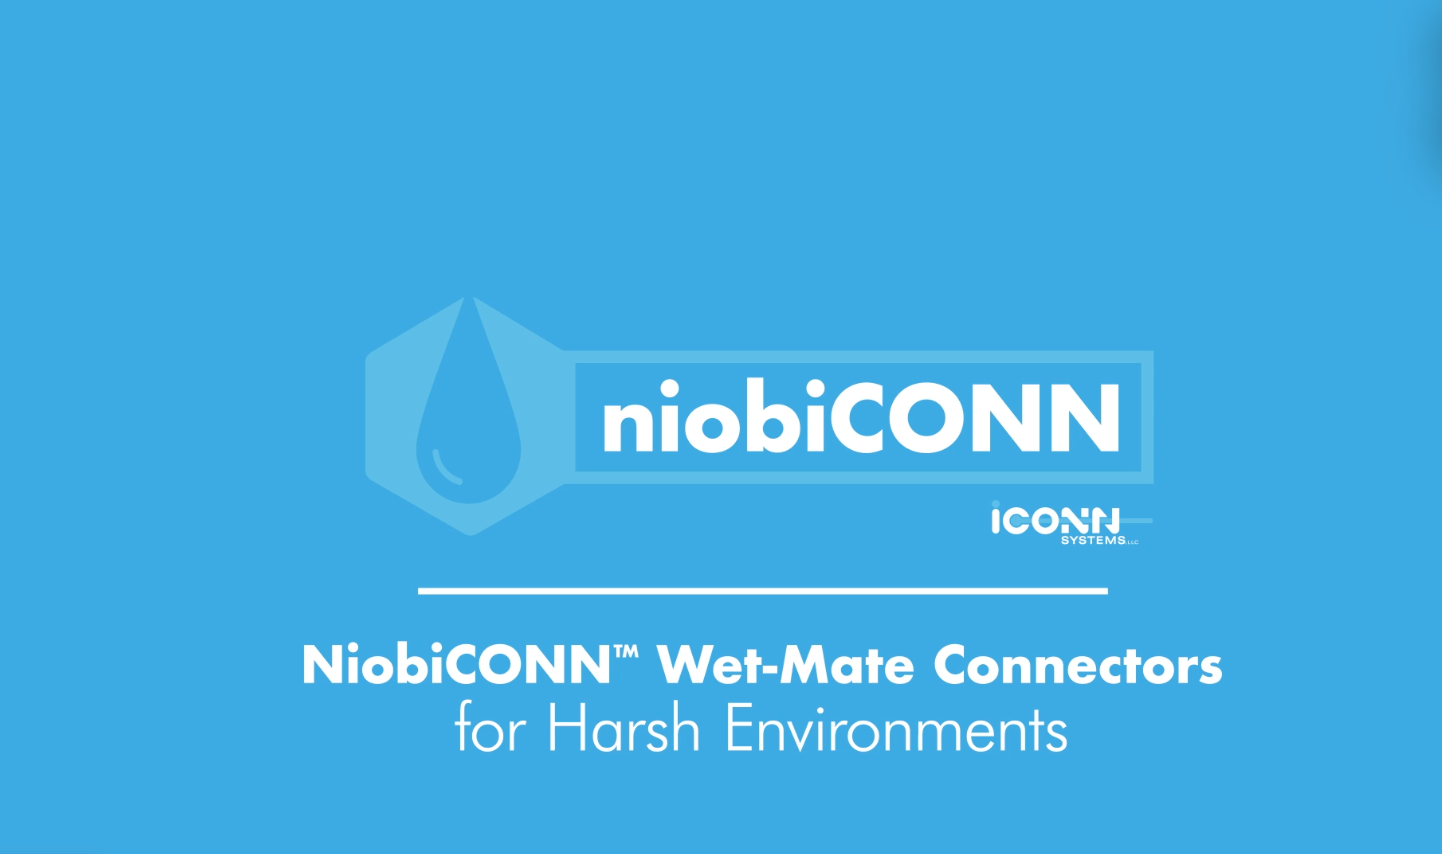 NiobiCONN-Wet-Mate-wCaptions-FINAL